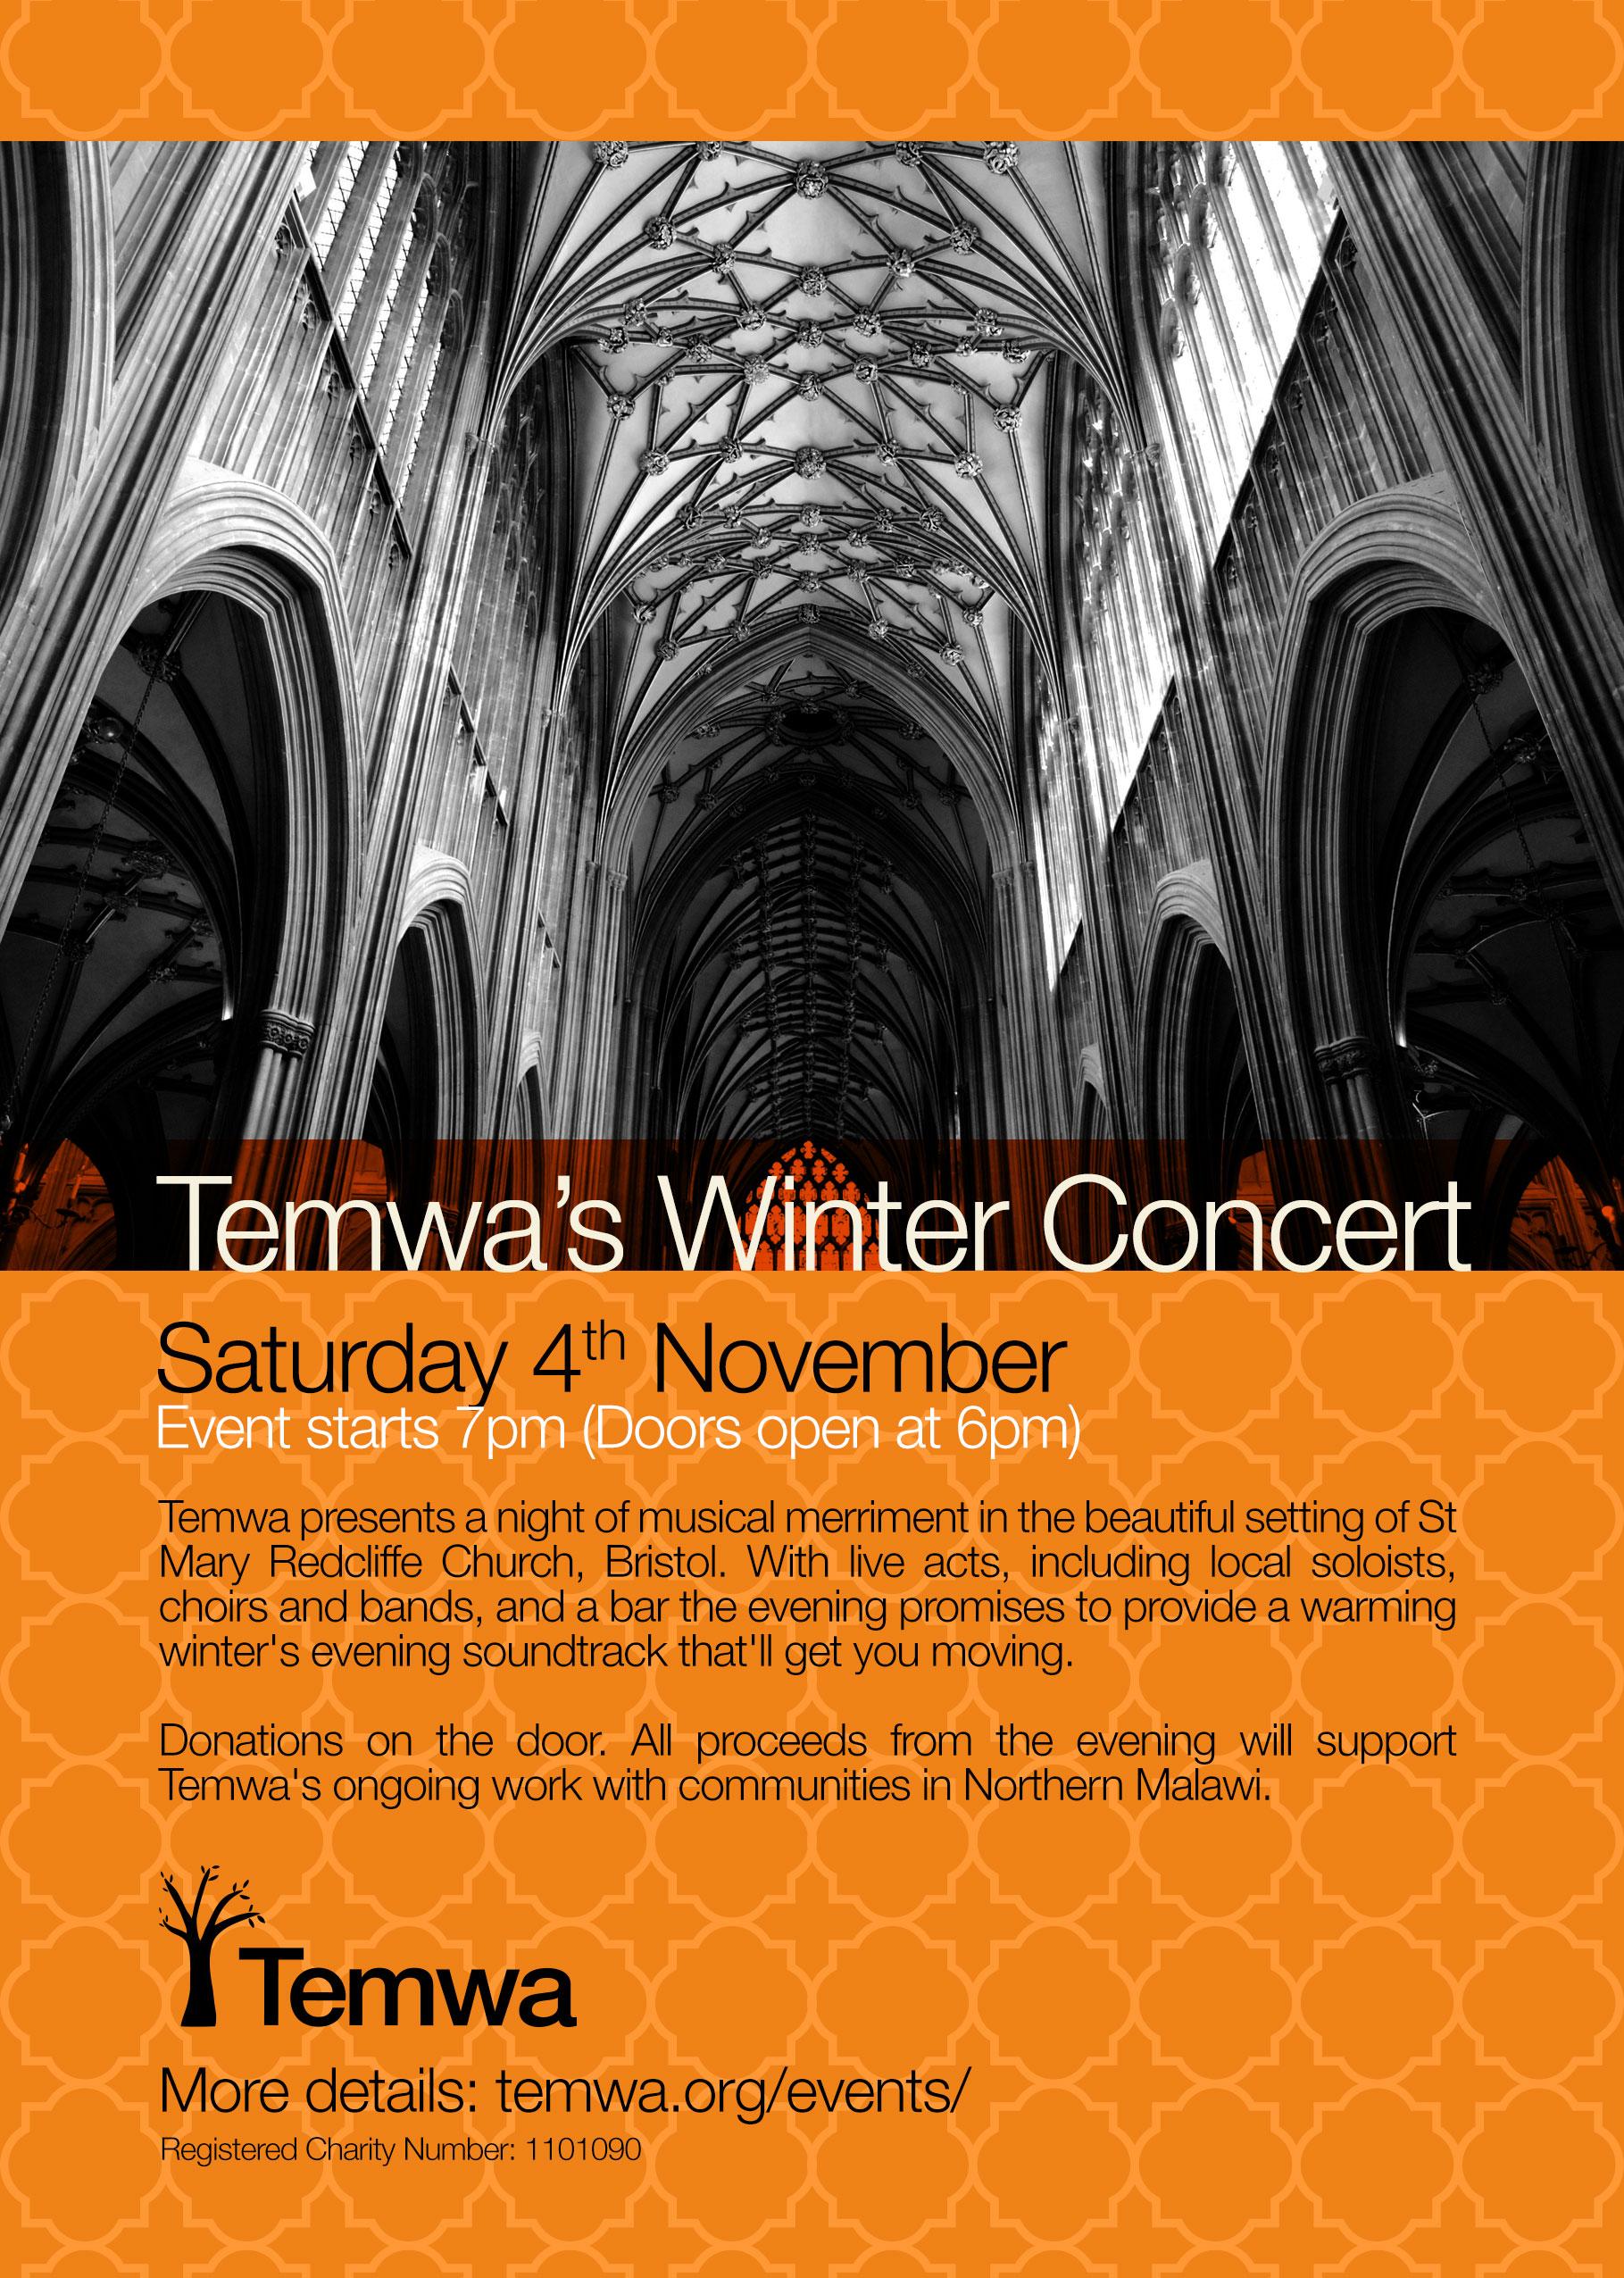 170925_Temwa_Winter Concert